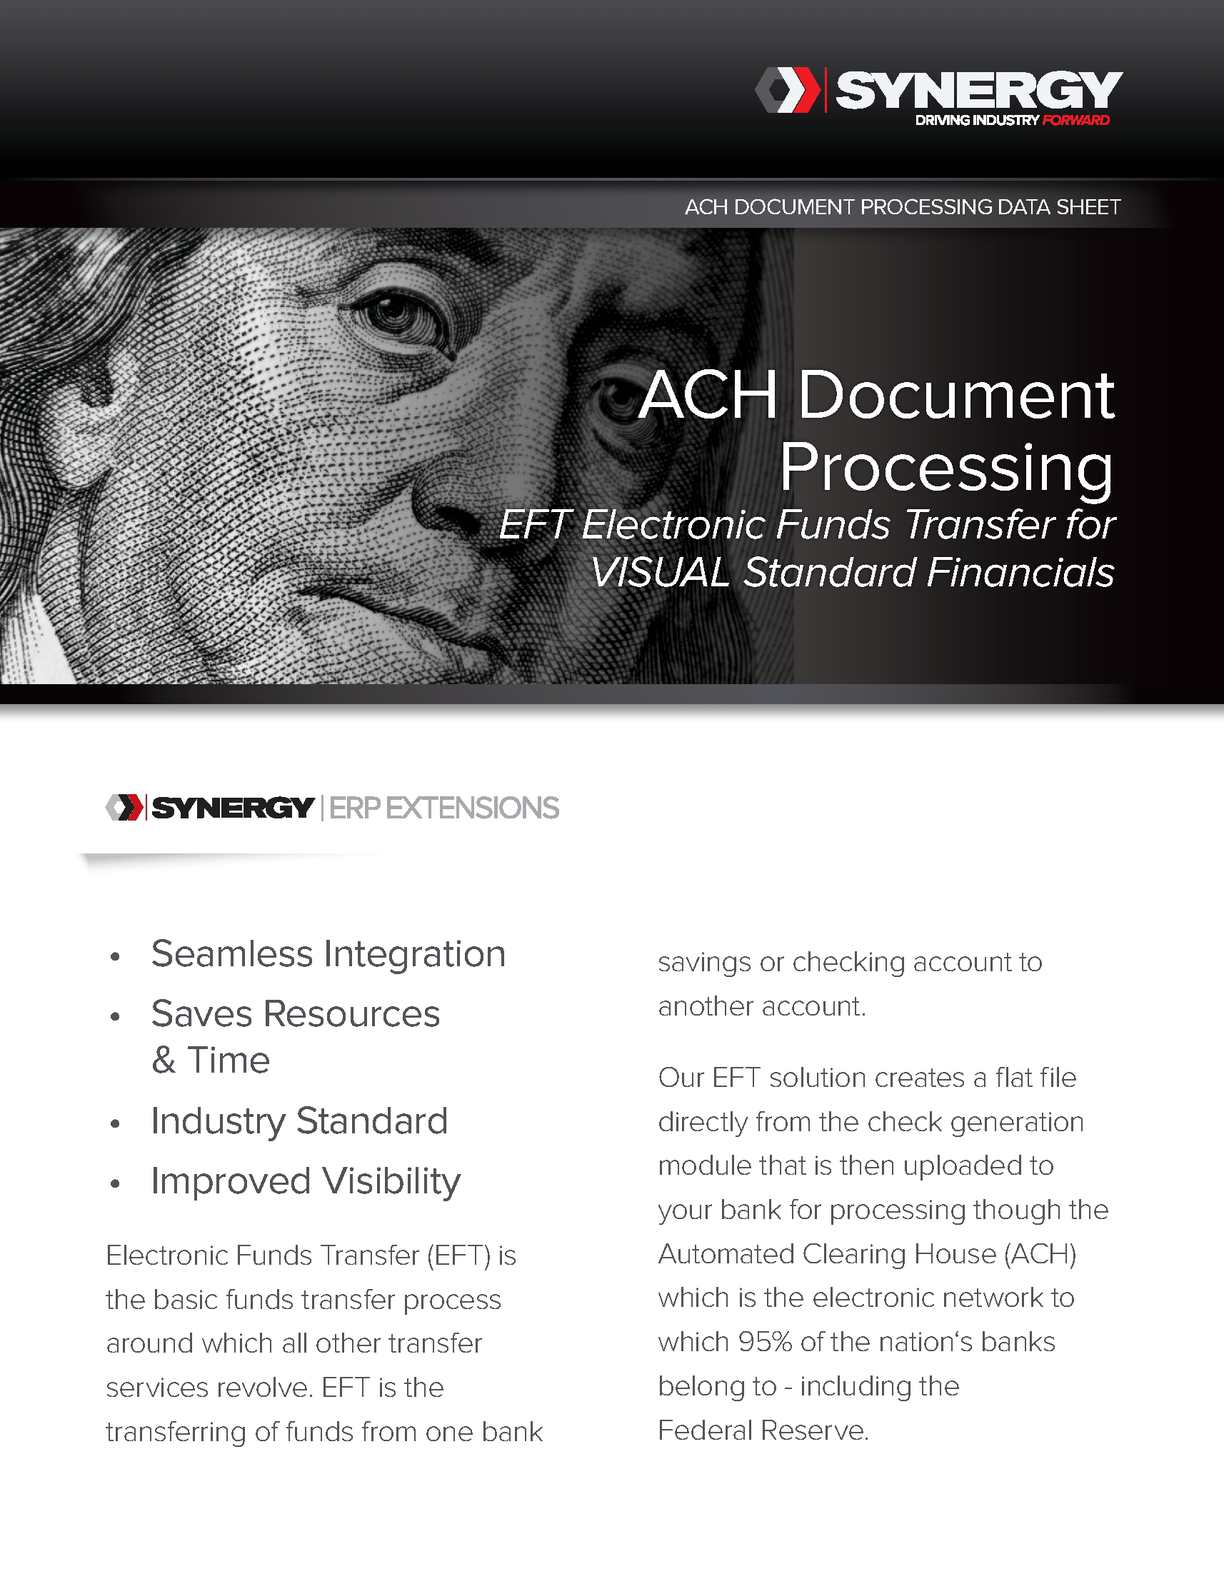 Calaméo - Ach Document Processing